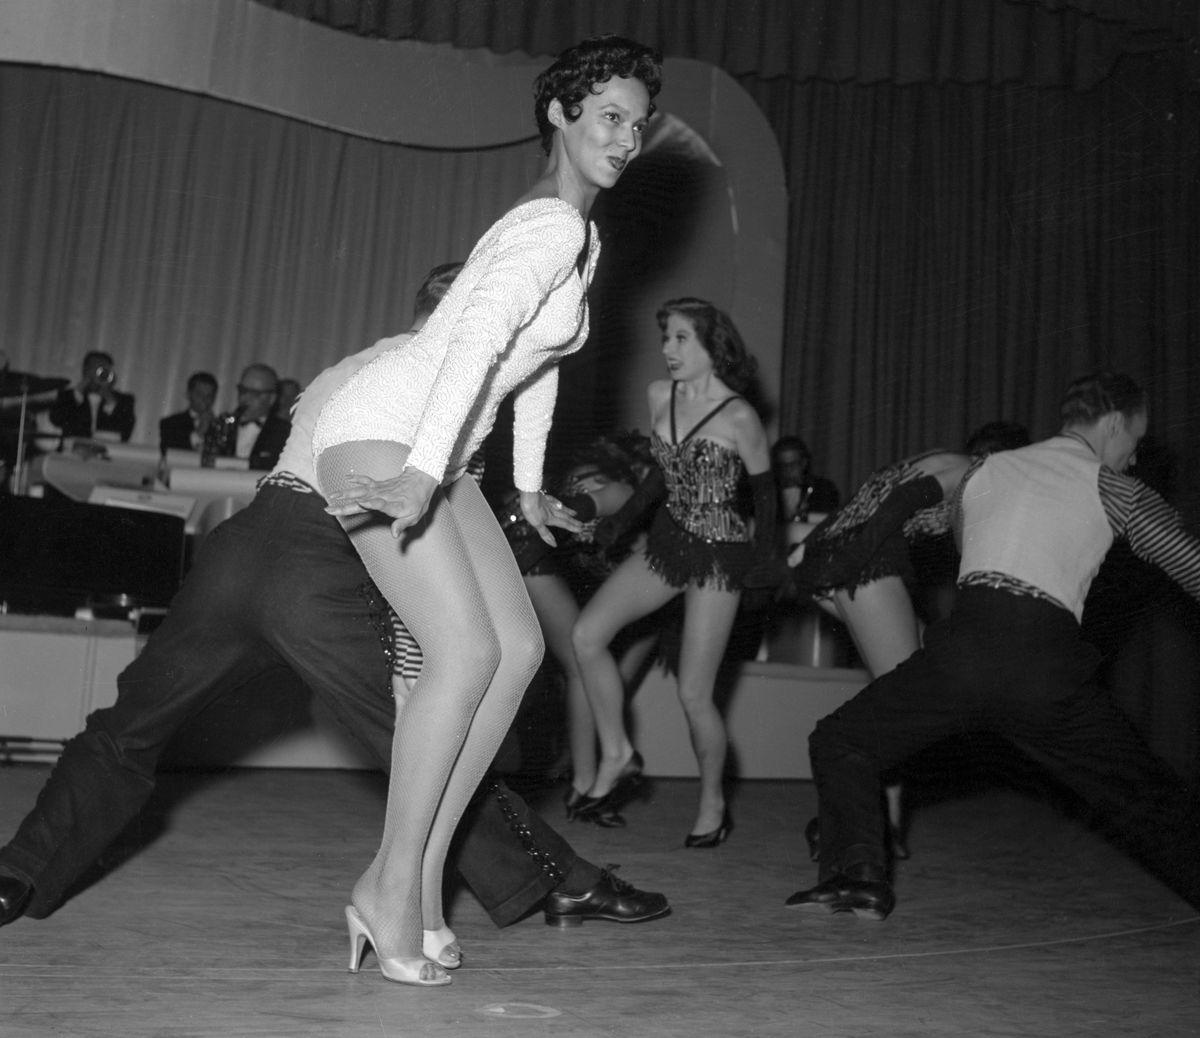 Slide 42 of 50: Dorothy Dandridge dances in a sequin leotard during her Las Vegas nightclub debut performance at the Riviera Hotel.